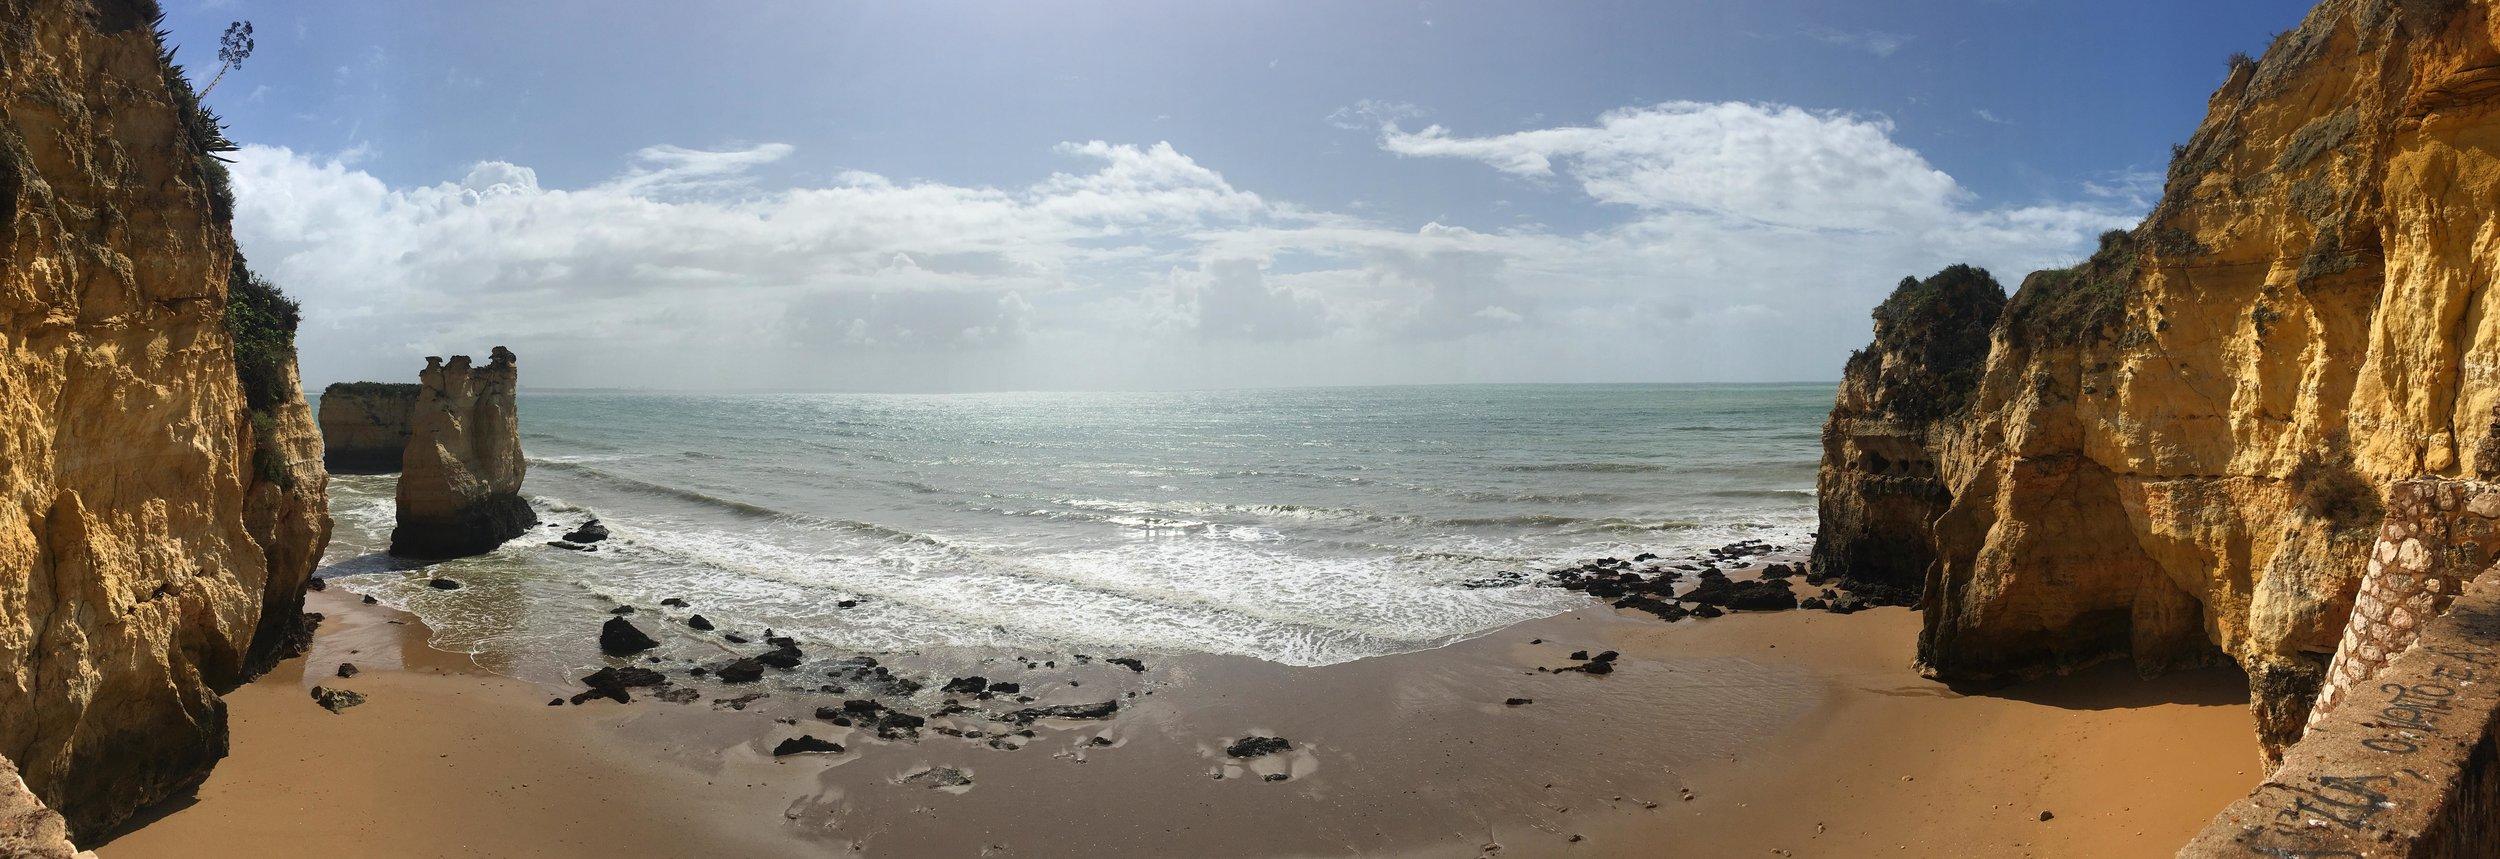 Lozidaze_Lagos-Playa-Pano_01